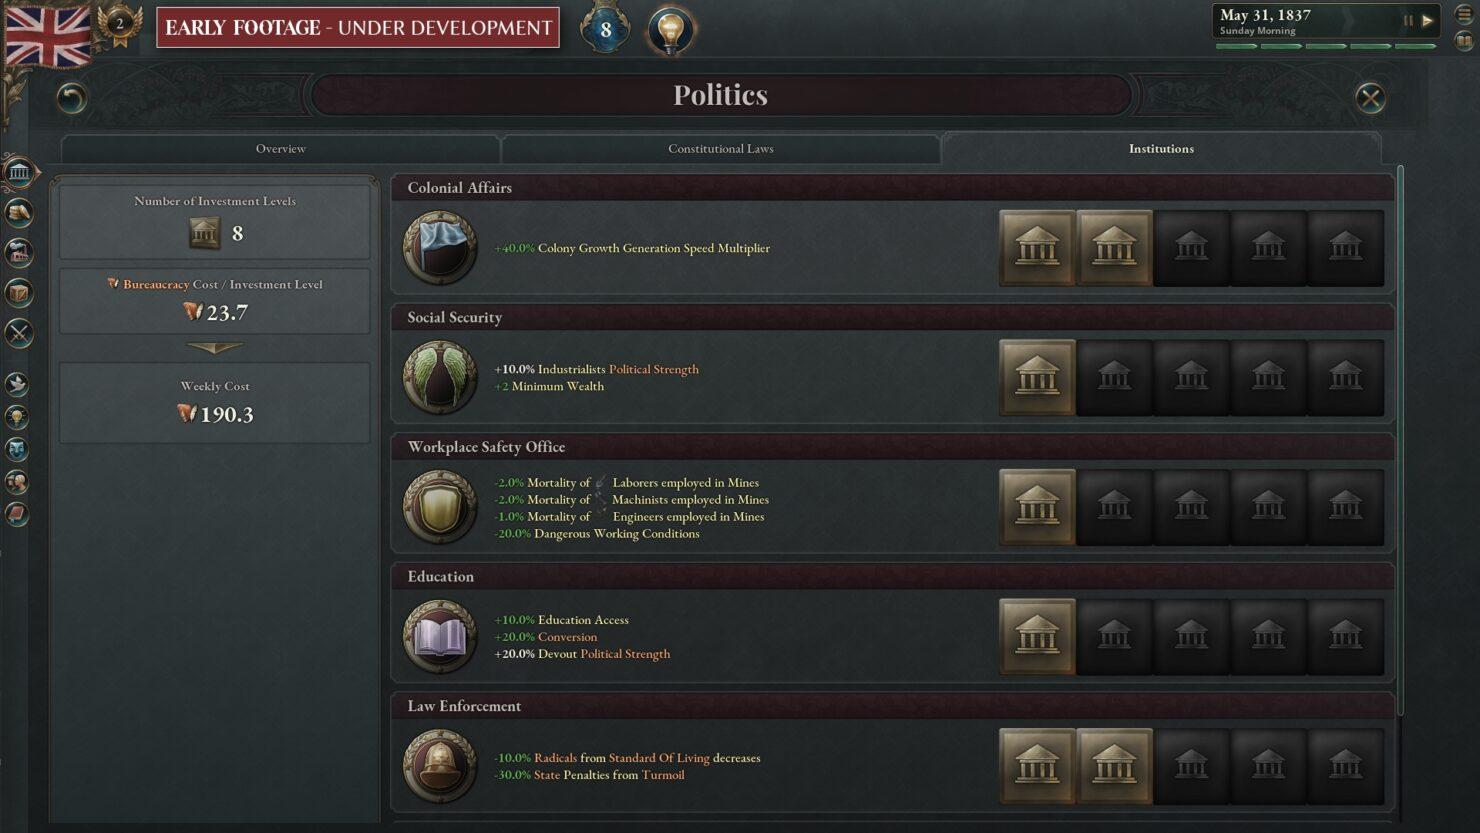 victoria-3-announcement-03-politics-1